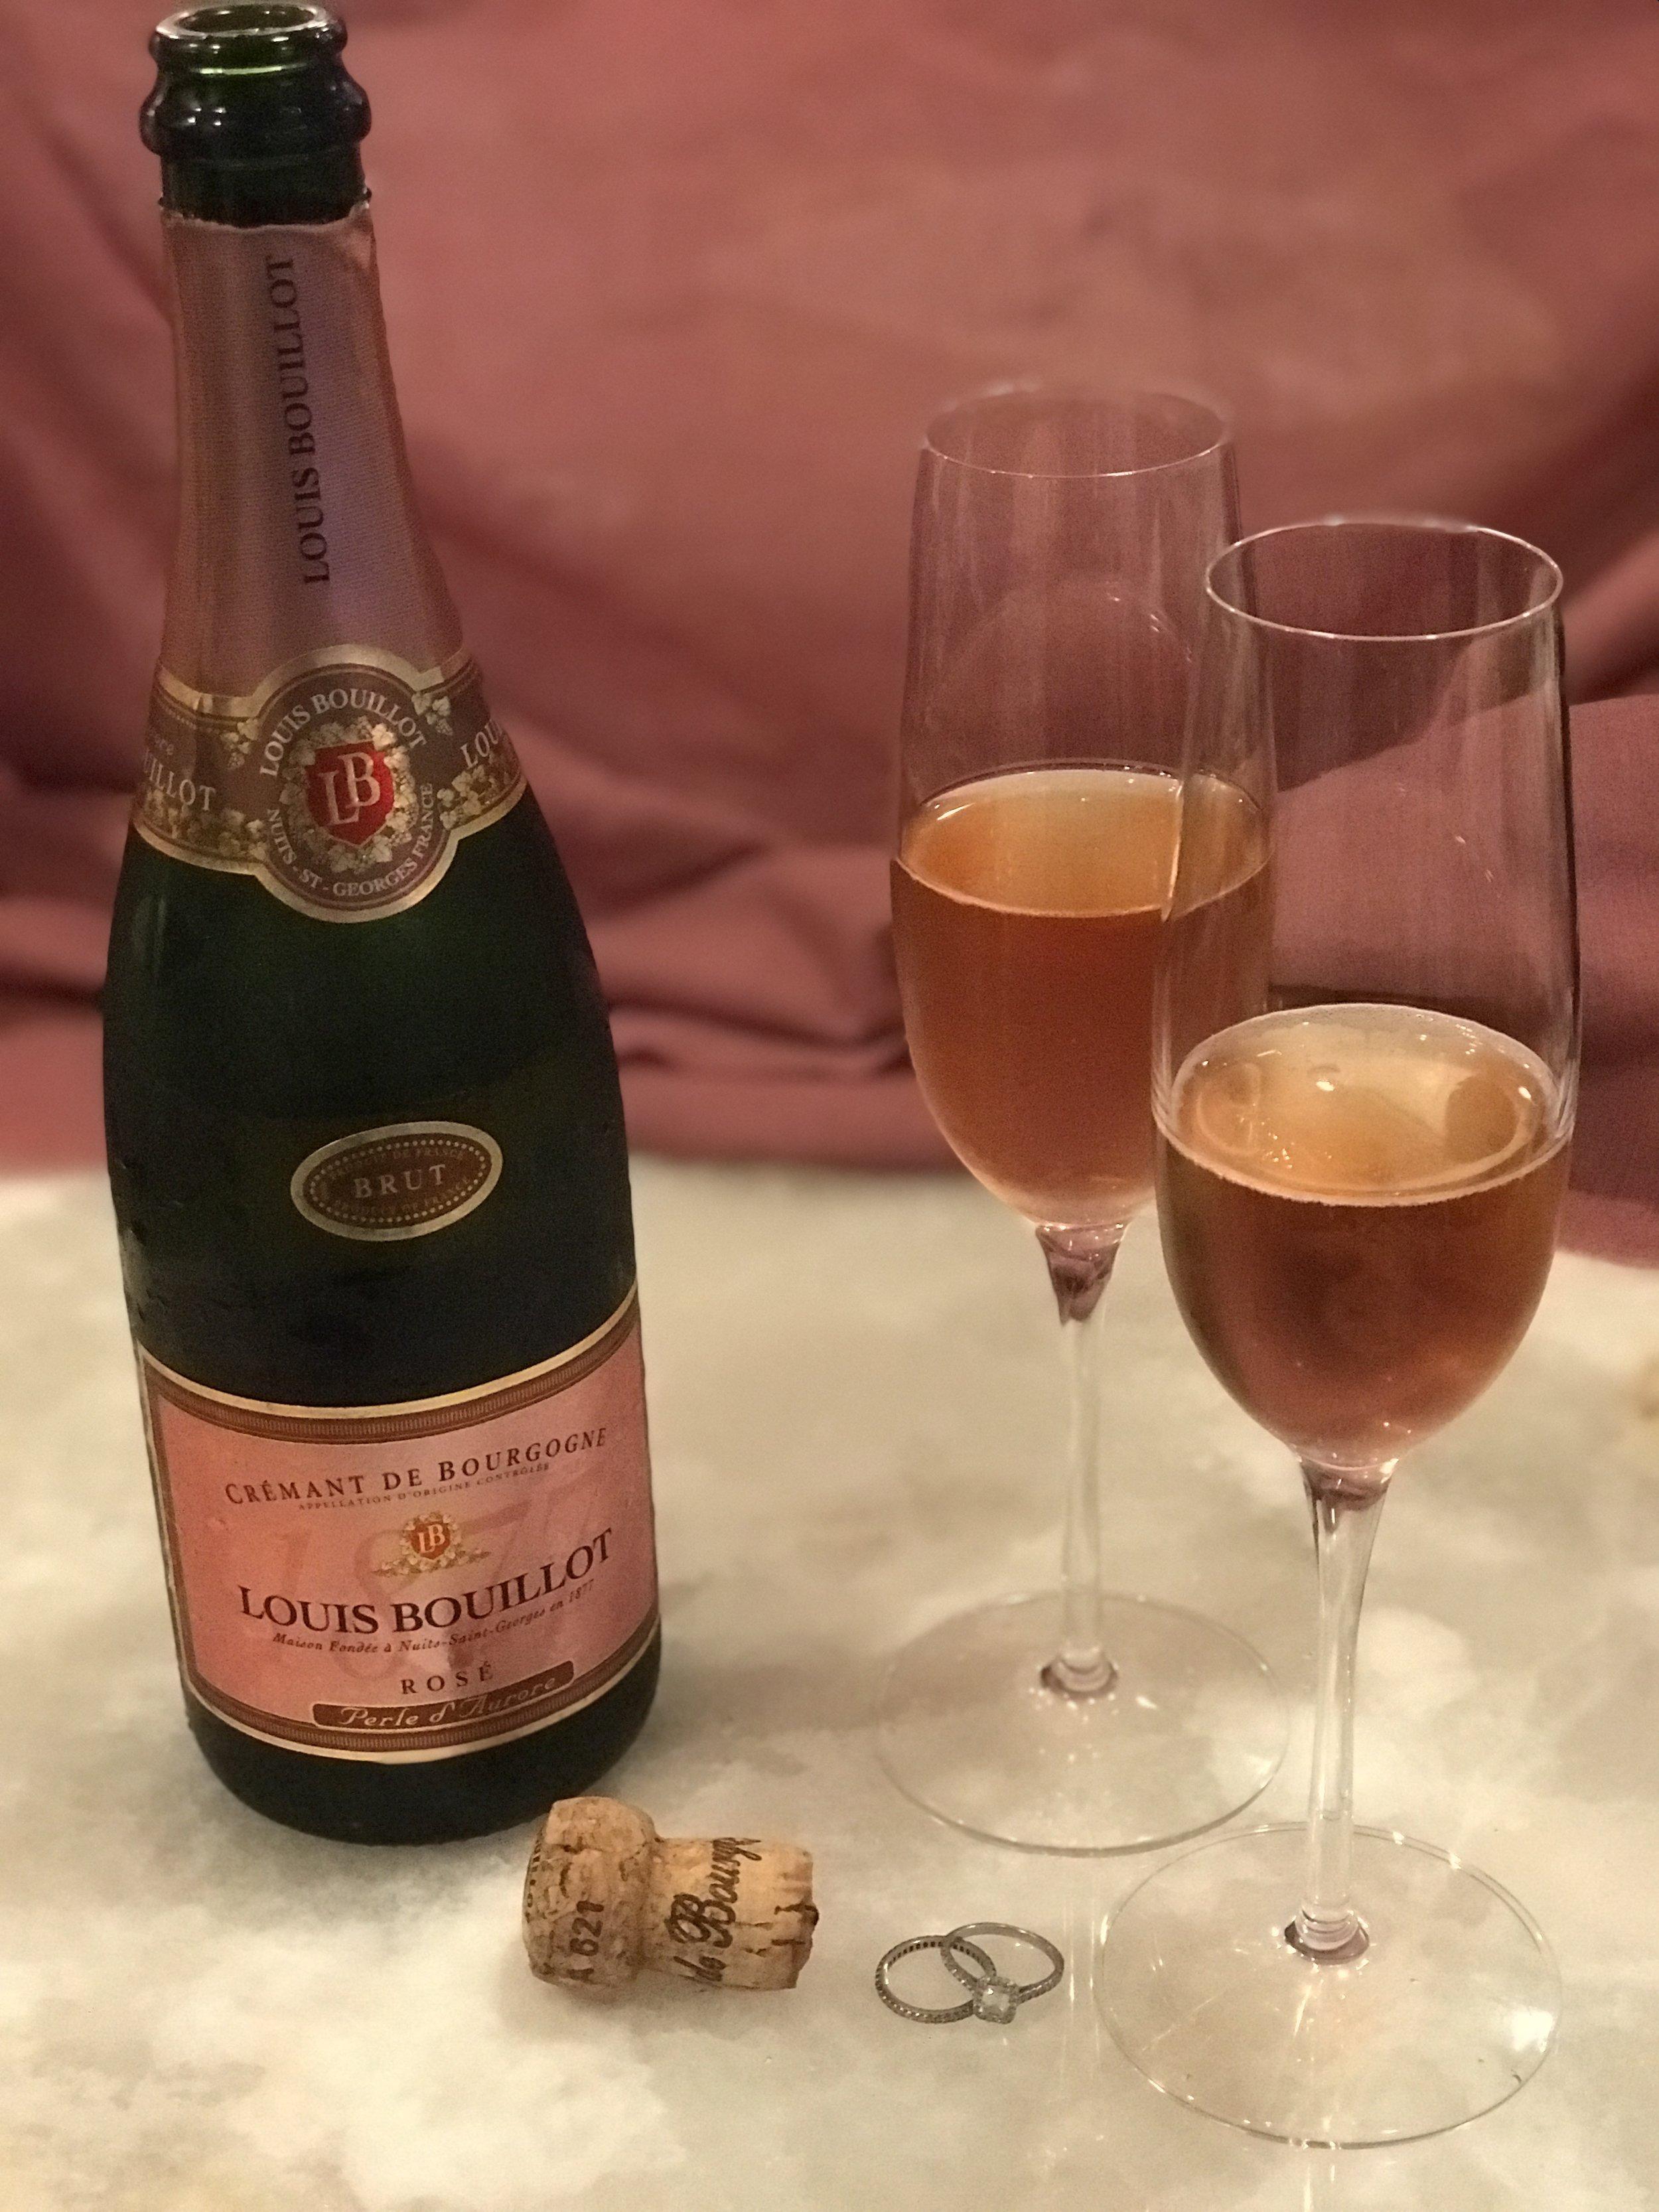 We drank champagne...